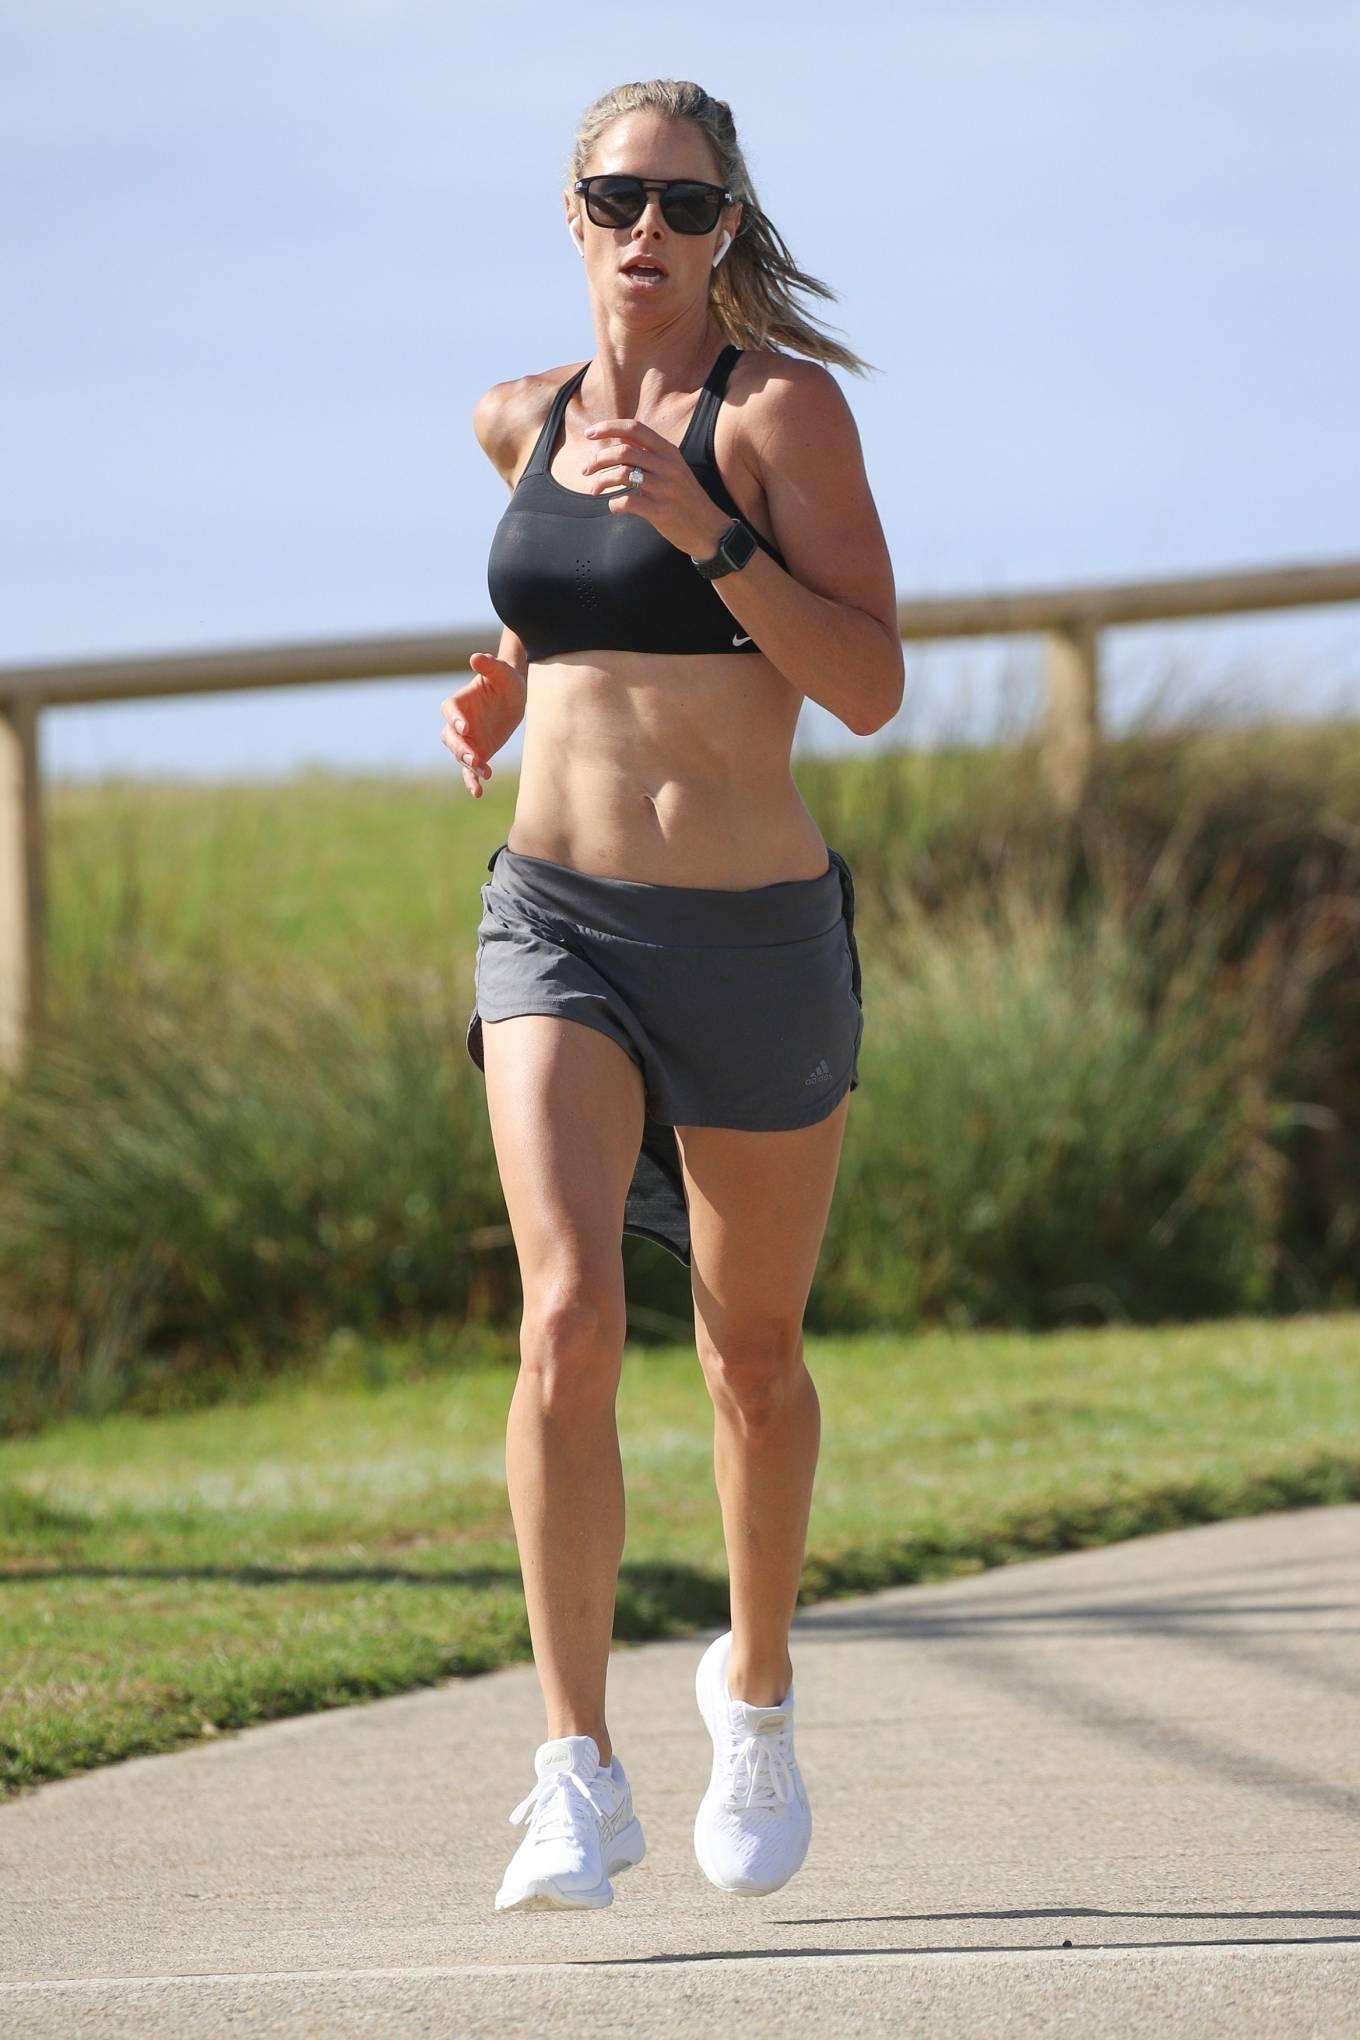 Candice Warner - Morning run in Sydney's Eastern Suburbs